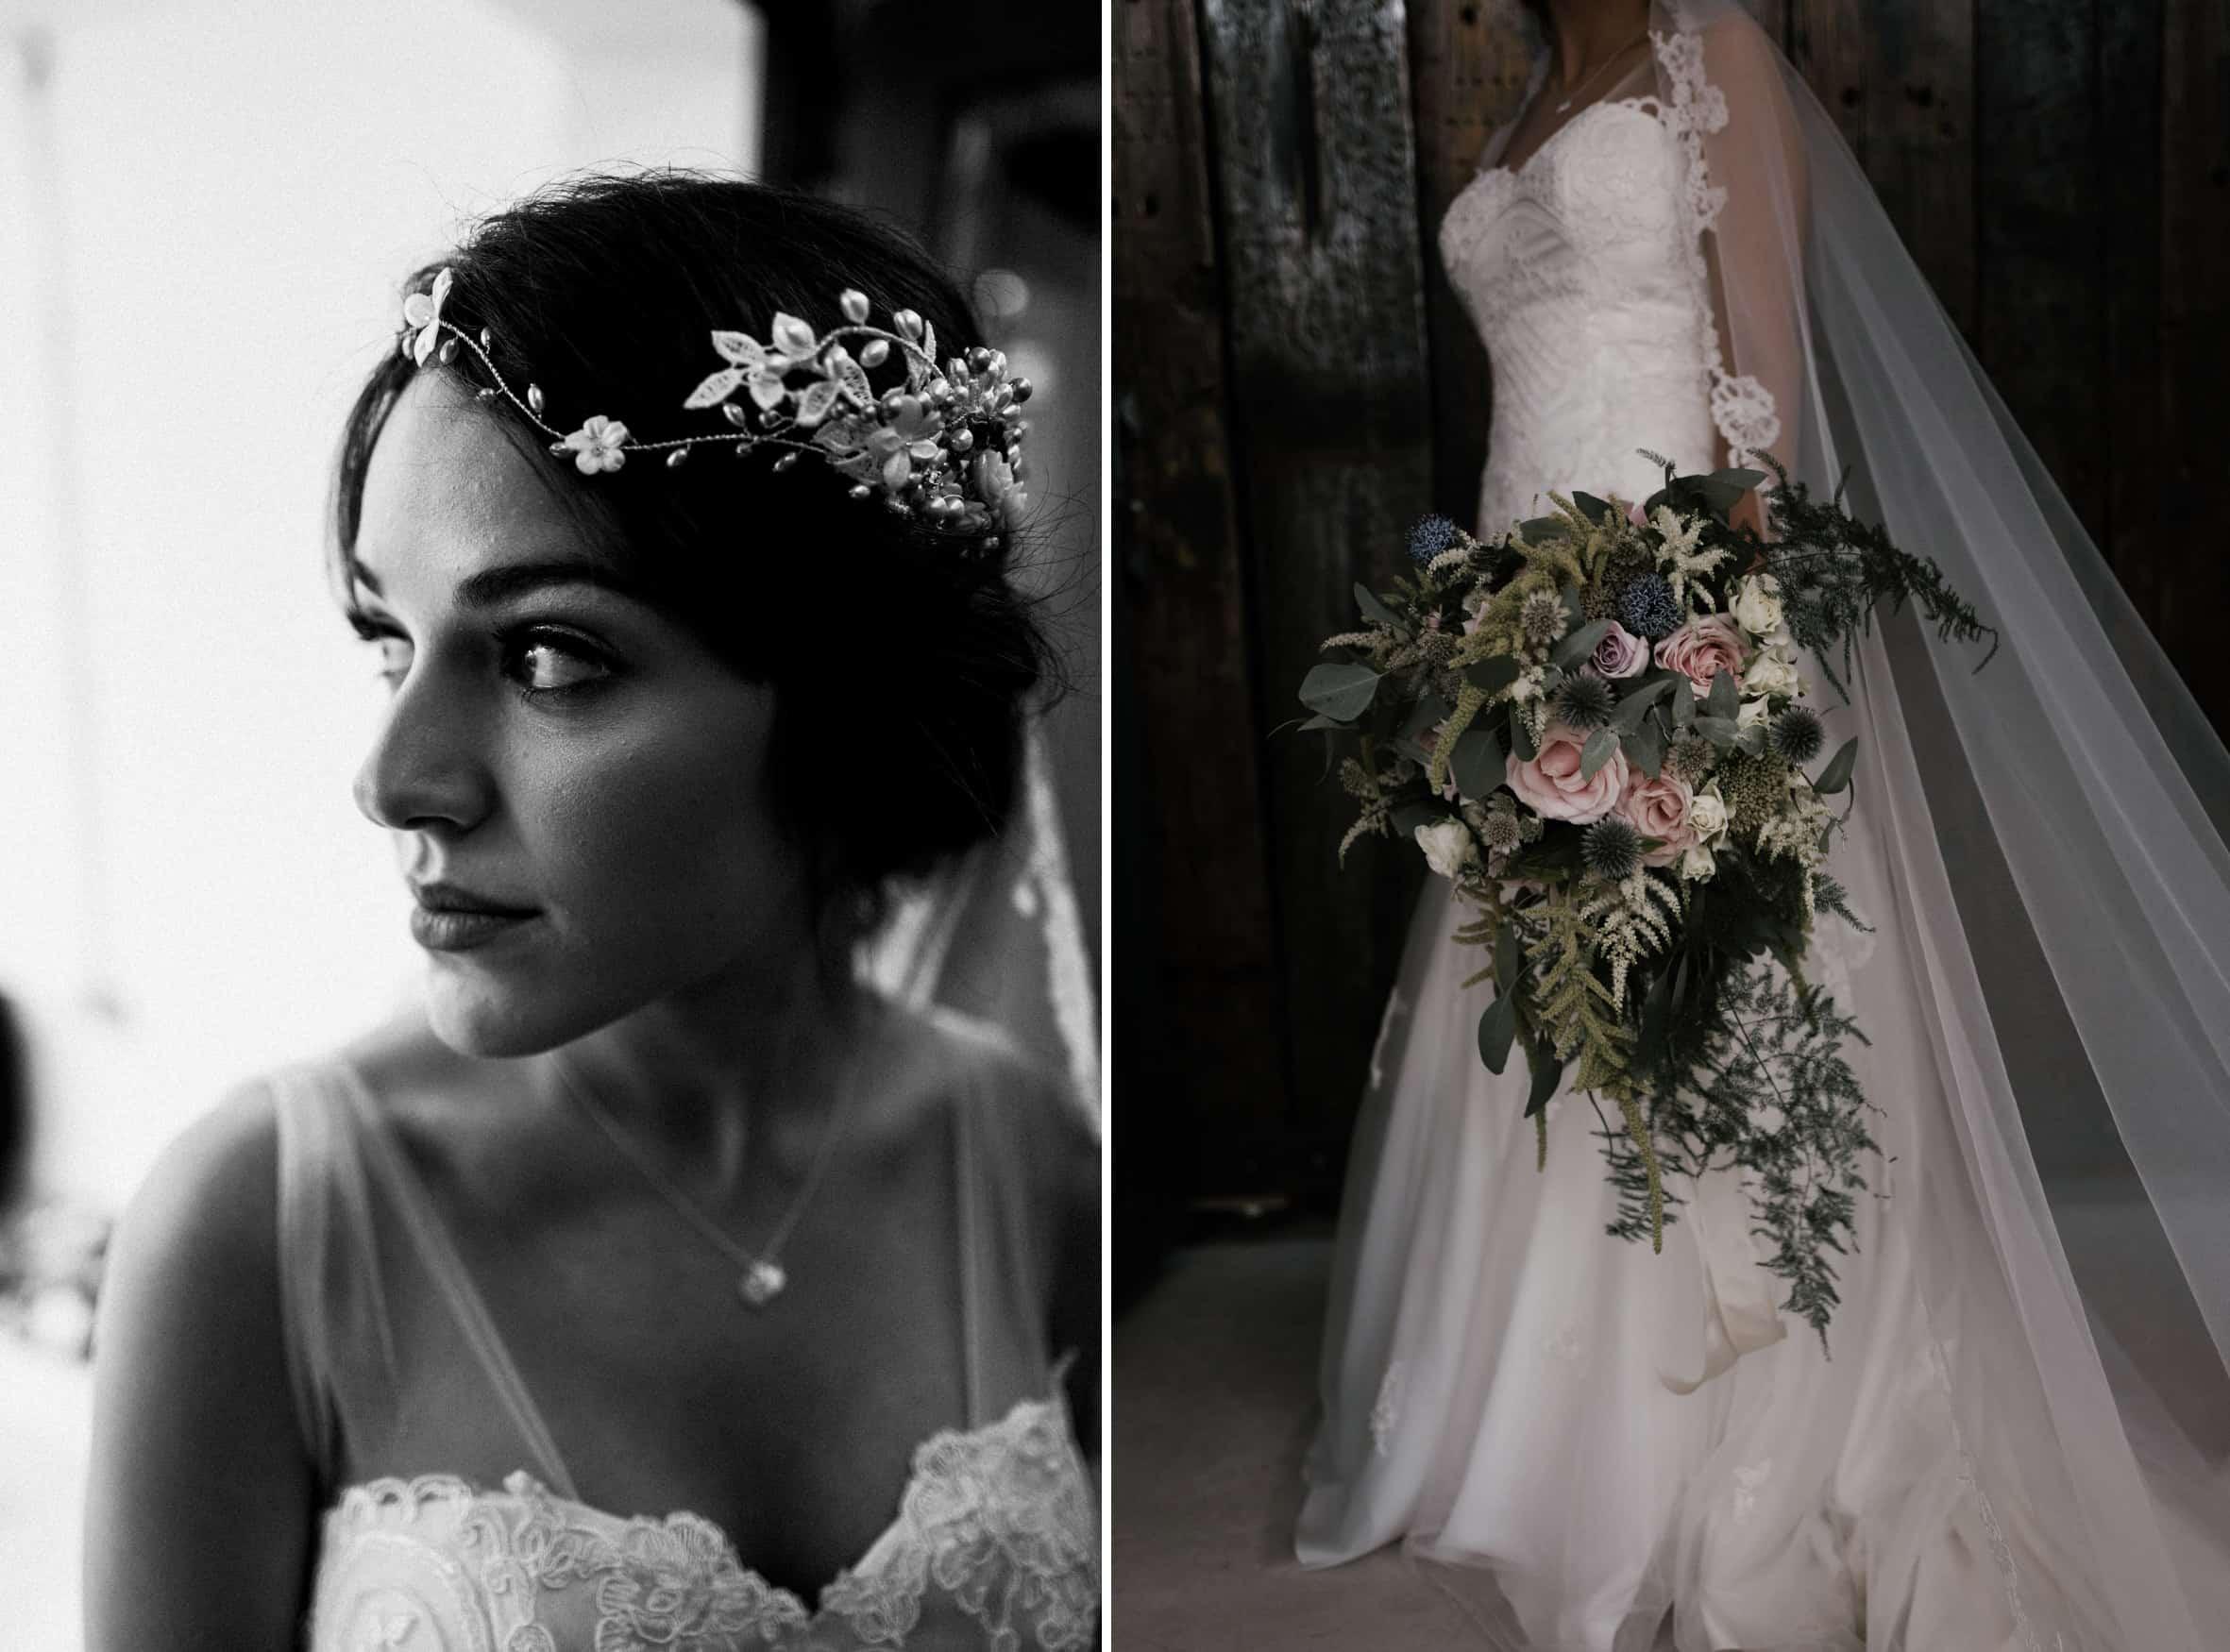 pre wedding bride portrait with flowers